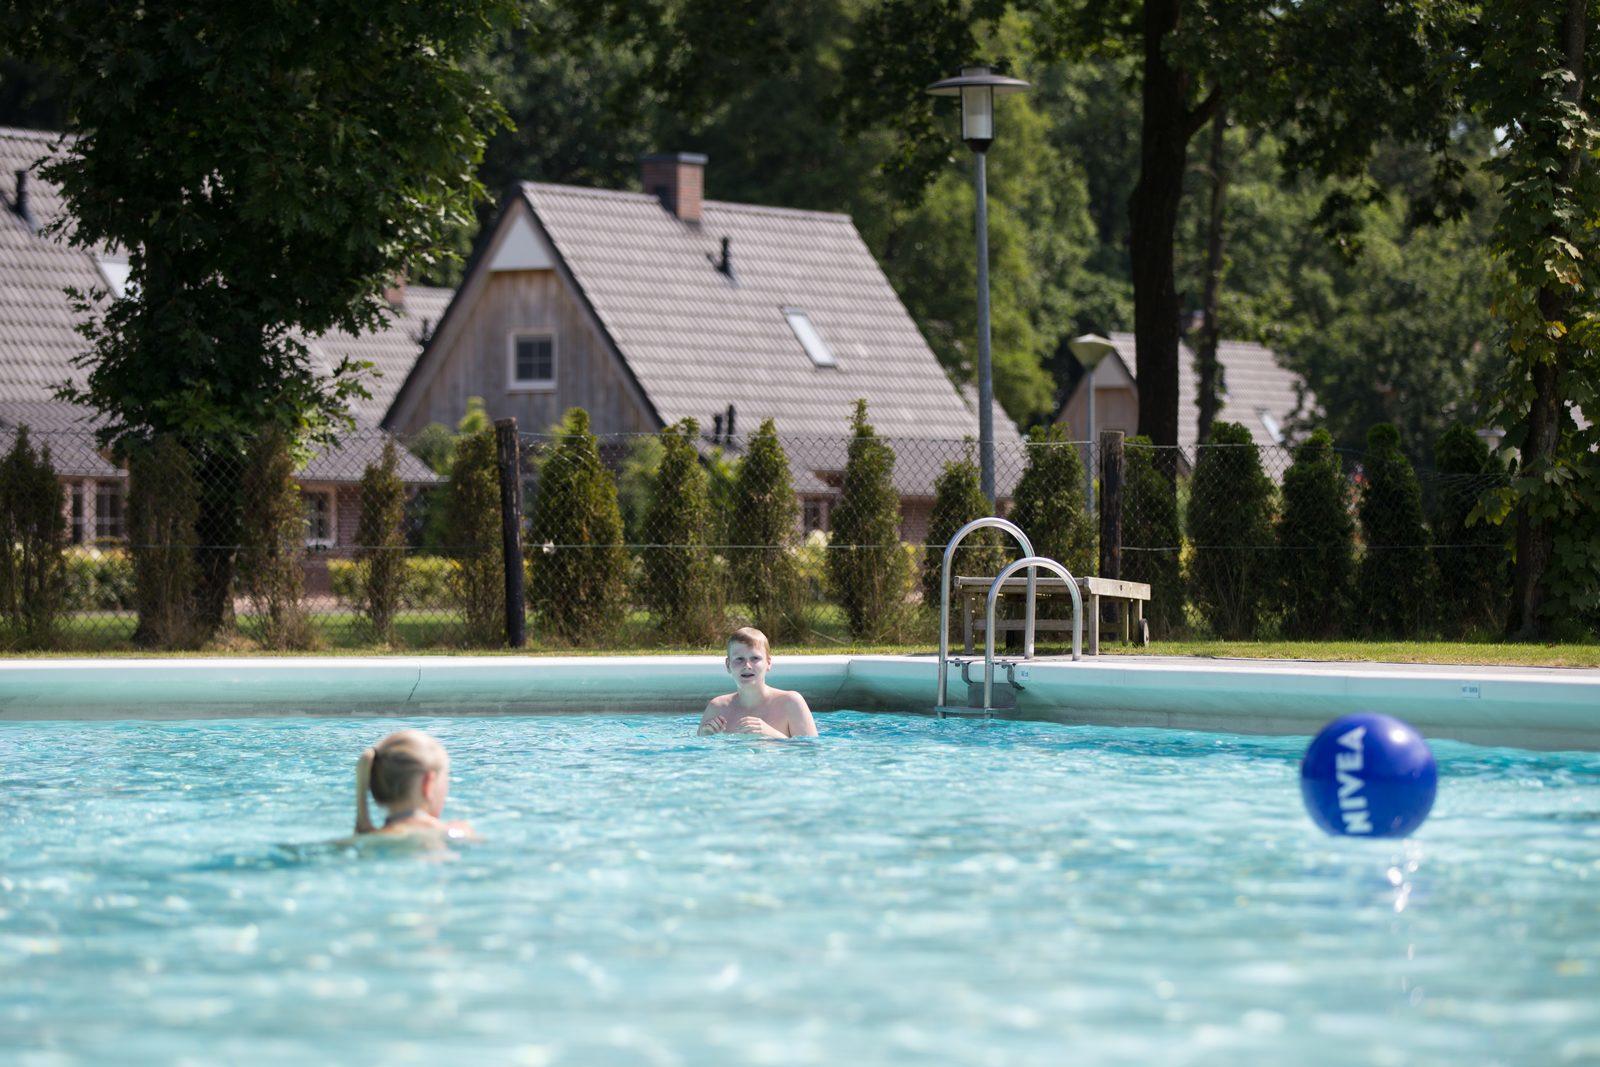 Child-friendly holiday resort